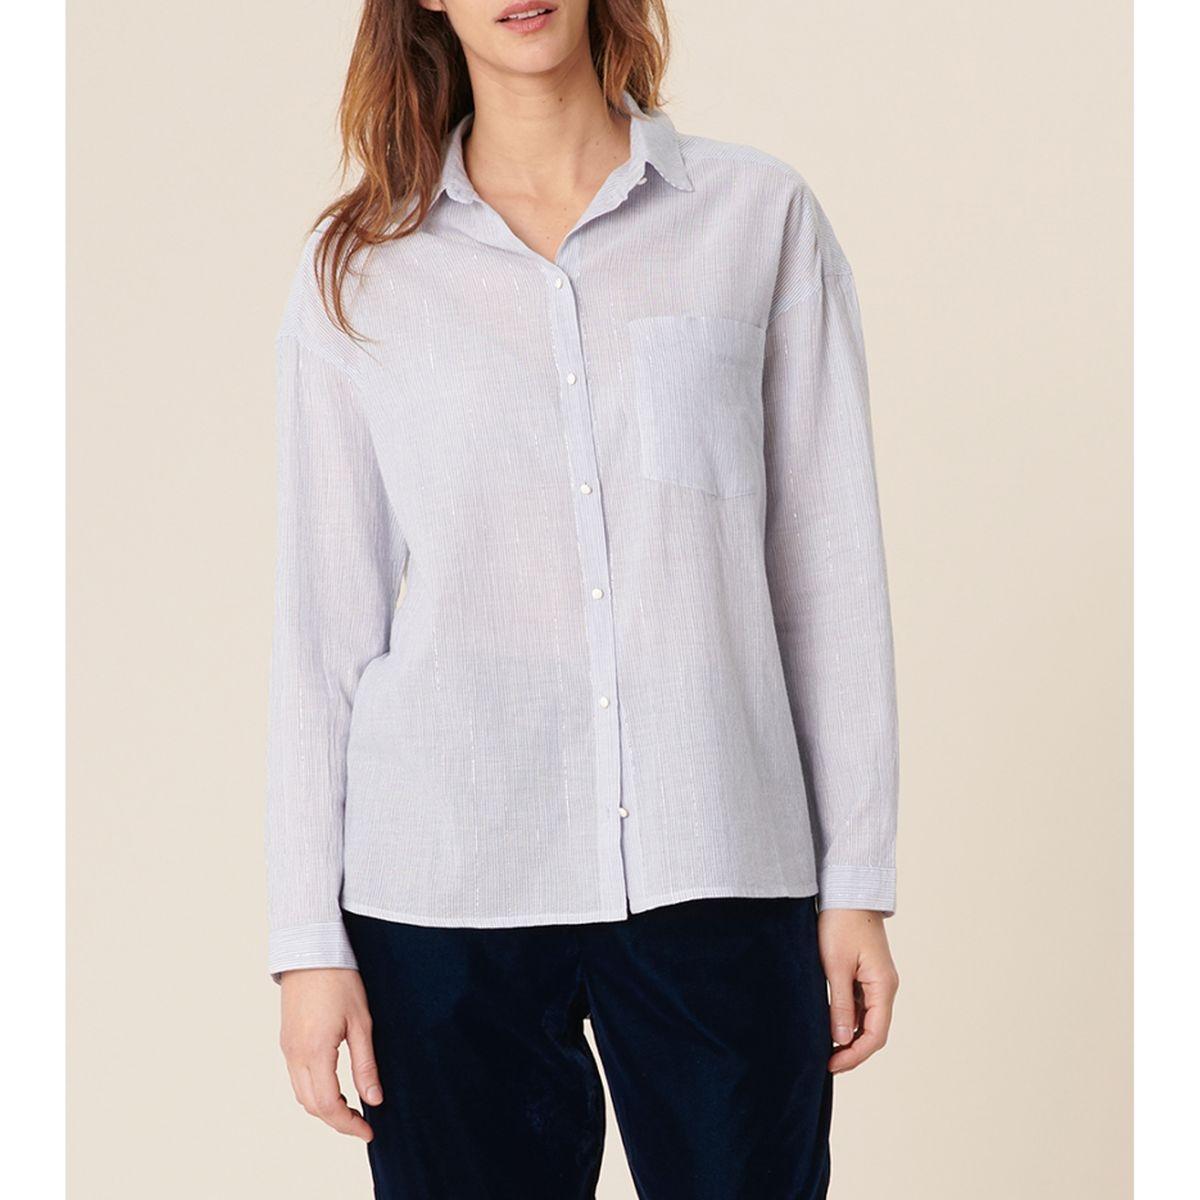 Chemise rayée avec fil irisé NAOKI